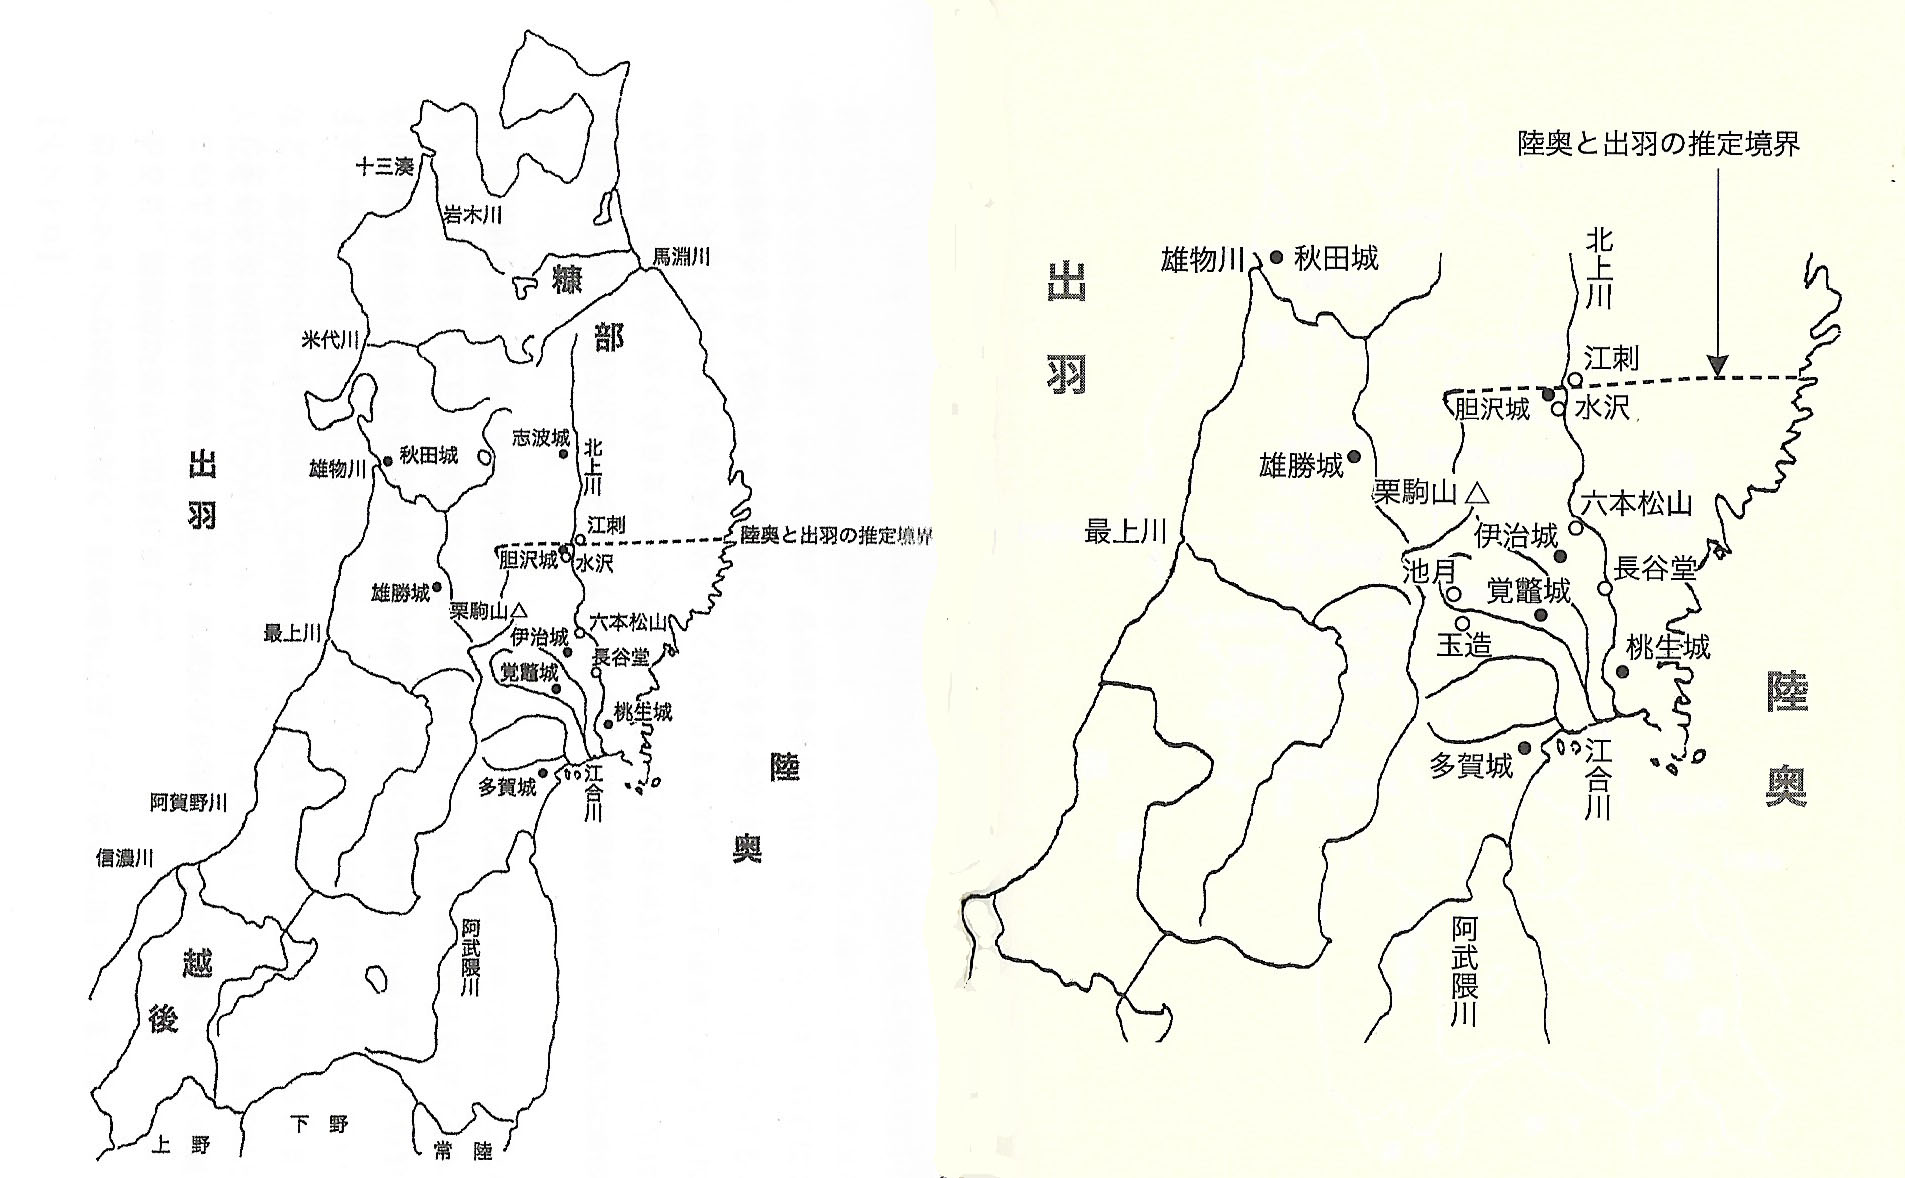 terui_party_map_1.jpg